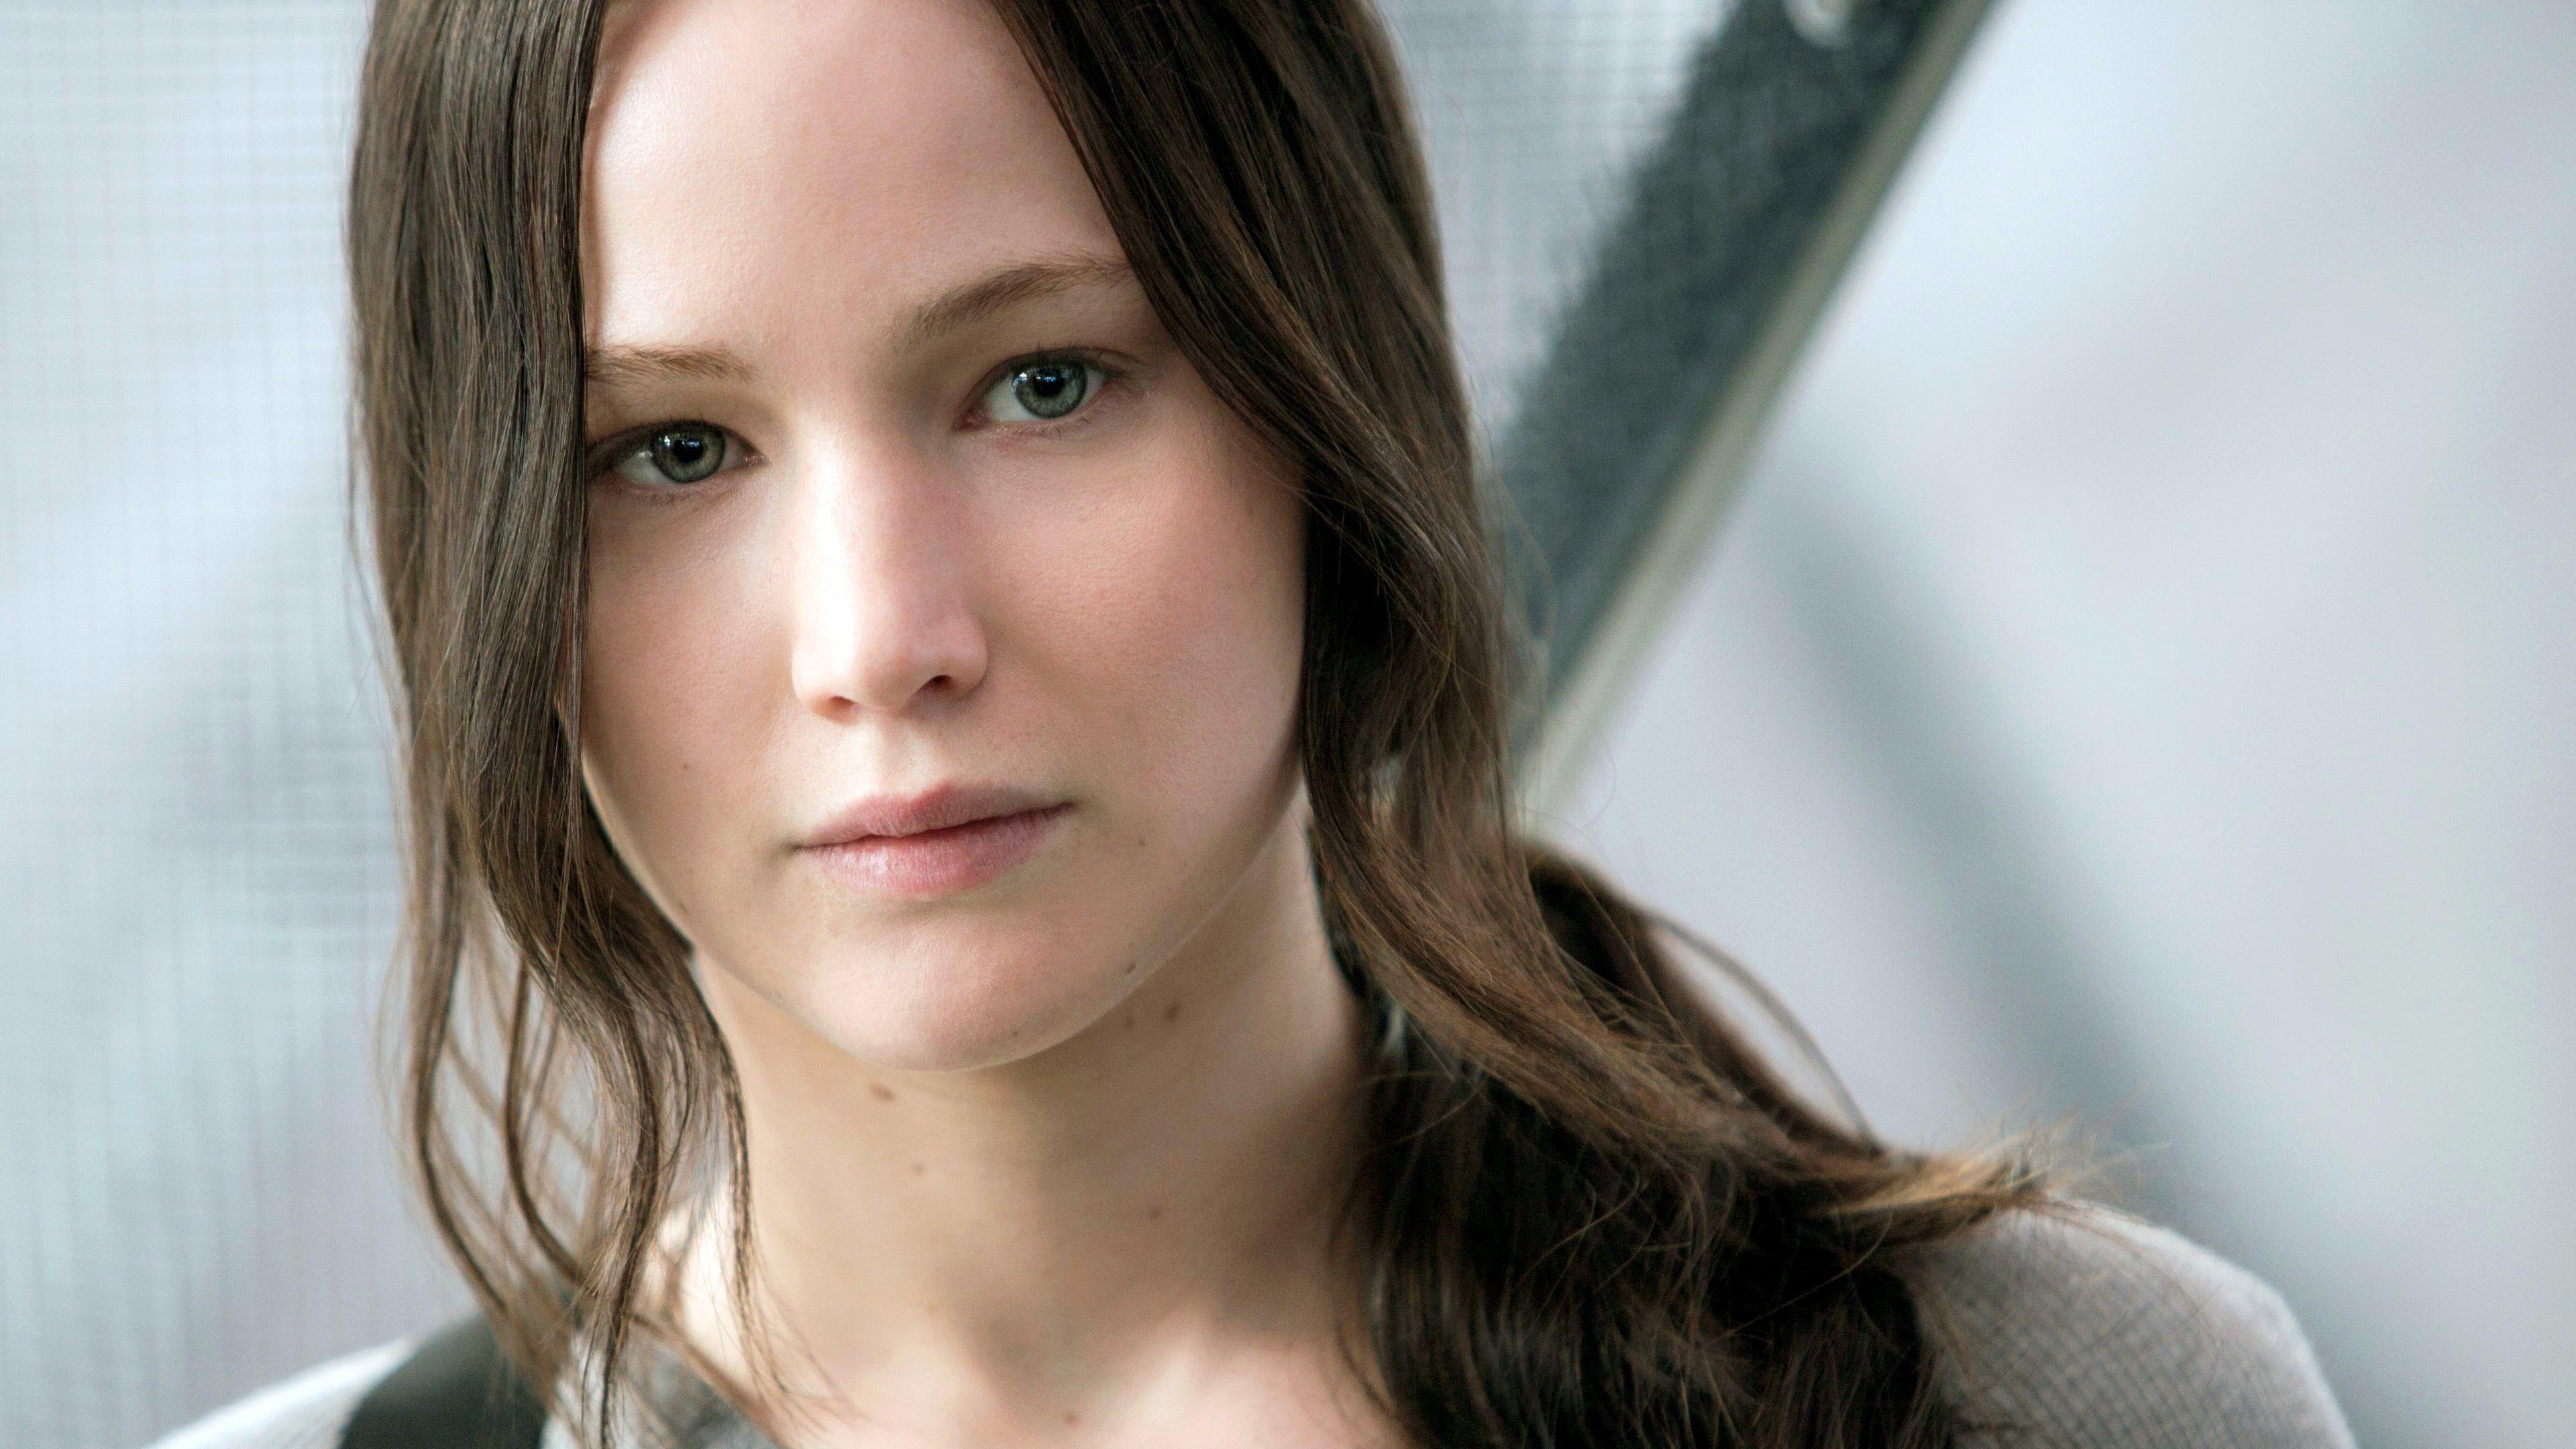 The Hunger Games Mockingjay Del 2 2015 Putlocker Film Complet Streaming Katniss Everdeen Jennifer Lawrence Mockingjay Hunger Games Mockingjay Hunger Games